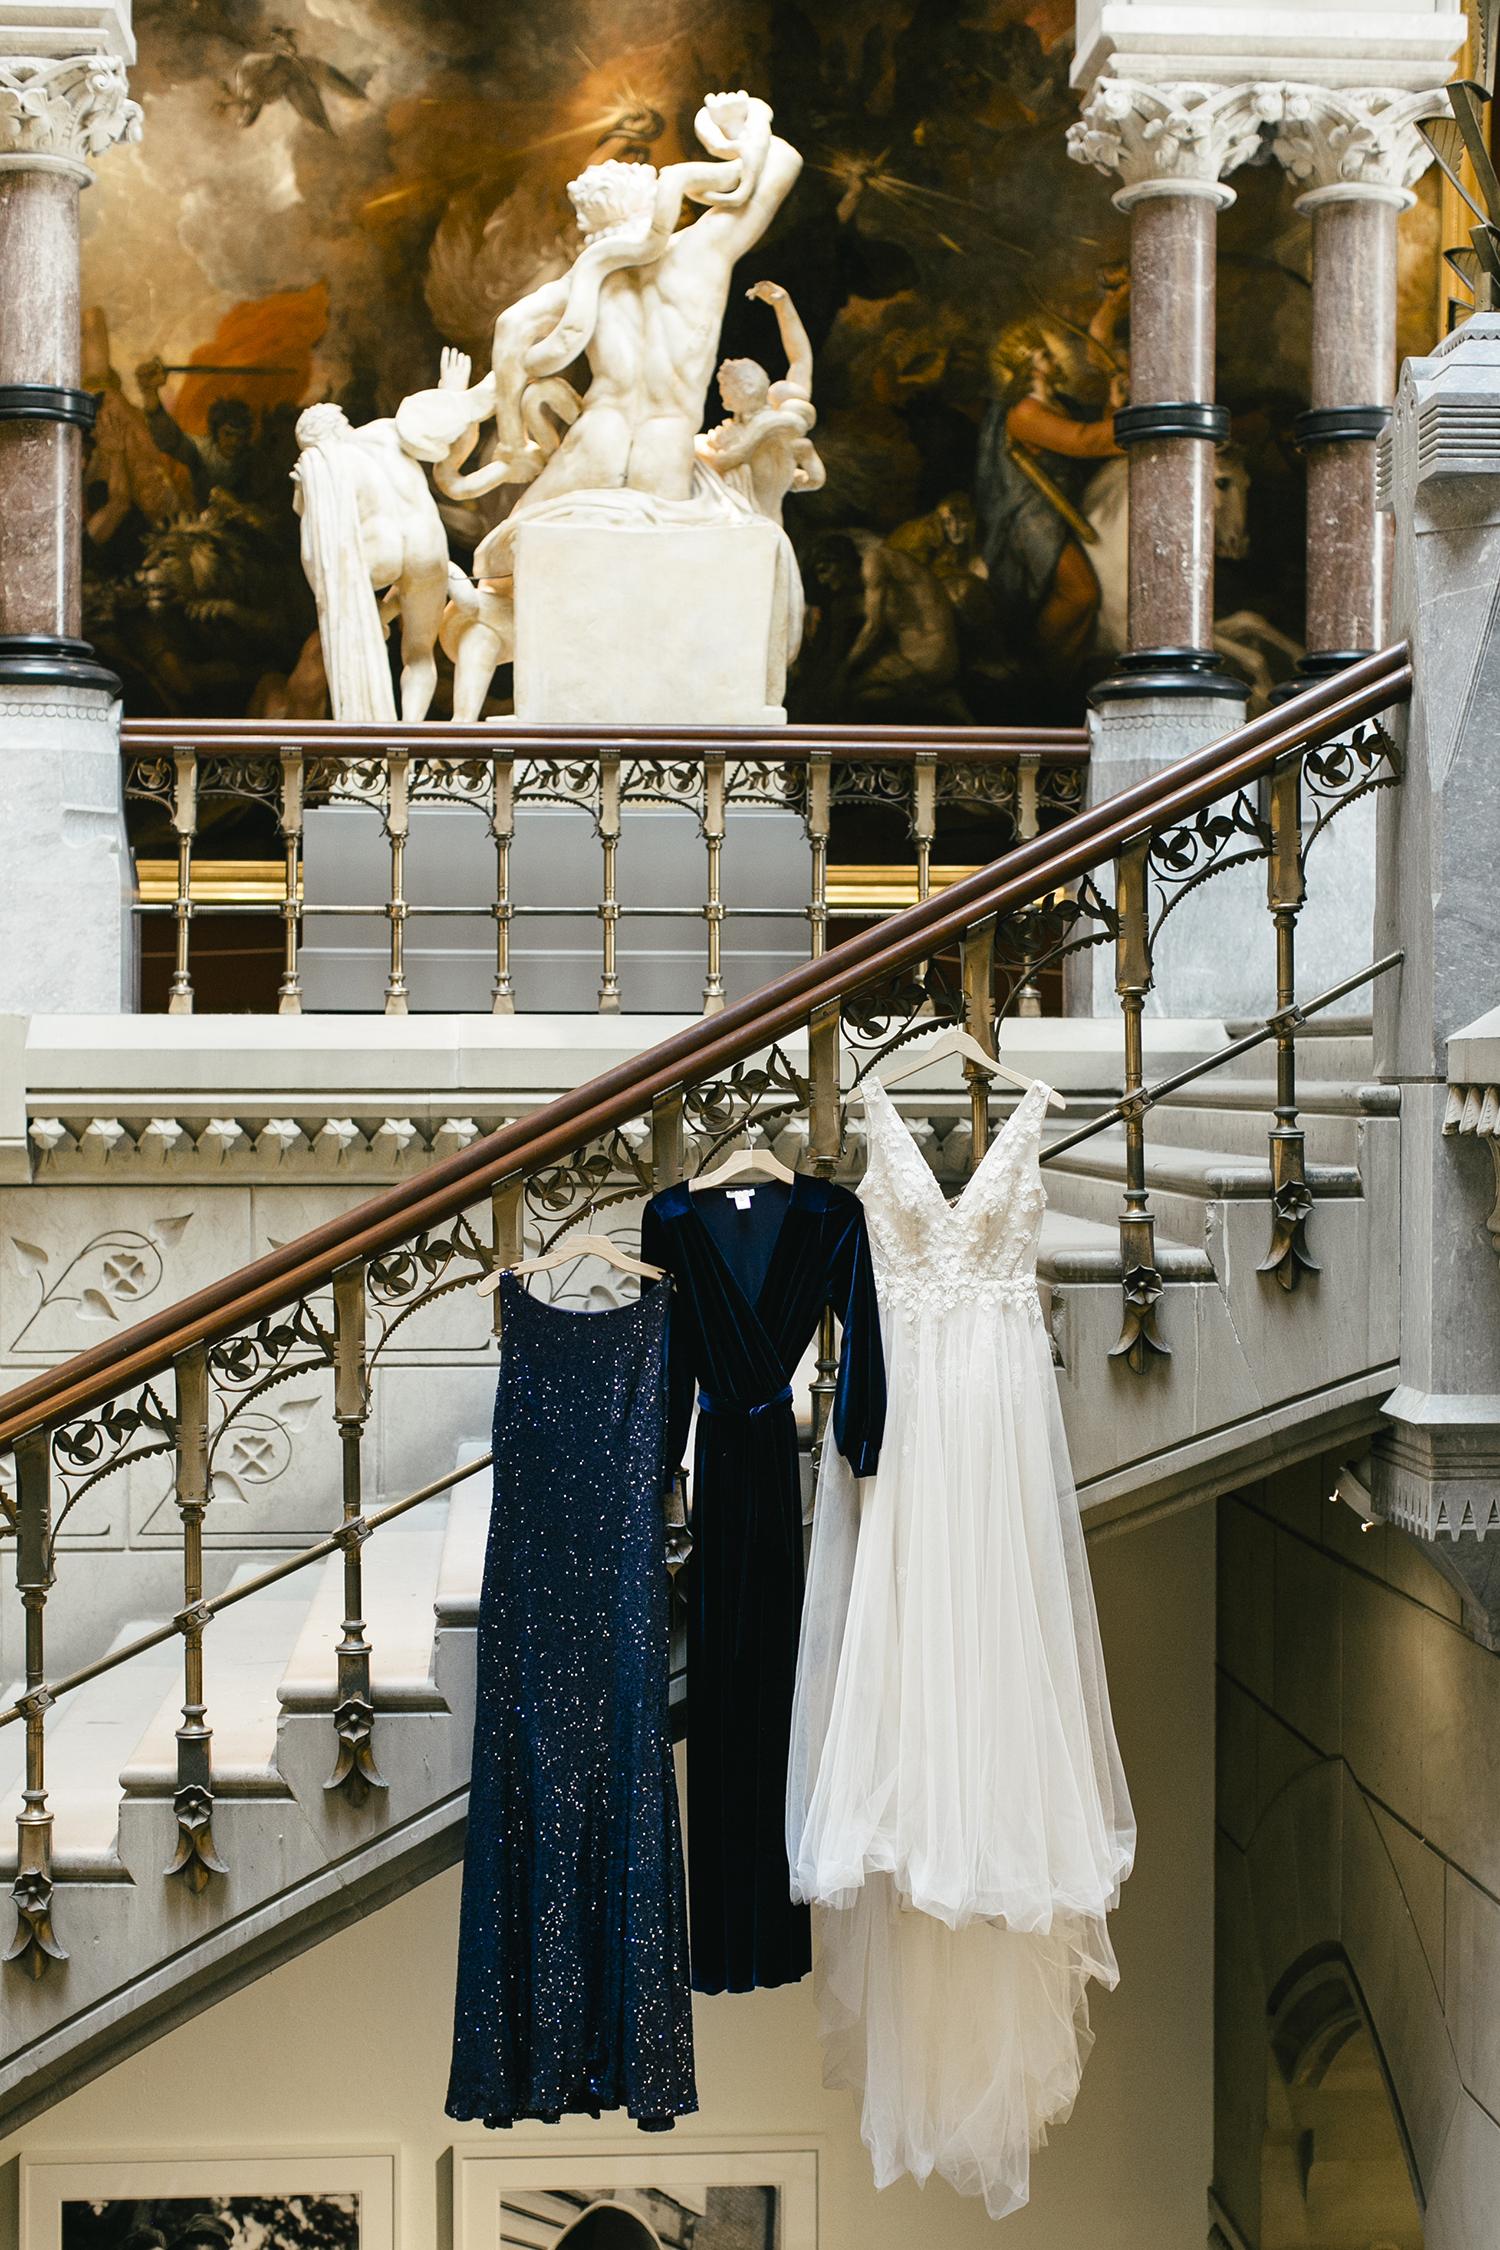 photography-wedding-weddings-natural-candid-pafa-pennsylvania academy-philadephia-philly-philadelphia wedding-mixed race-editorial-modern-fine-art-006.JPG